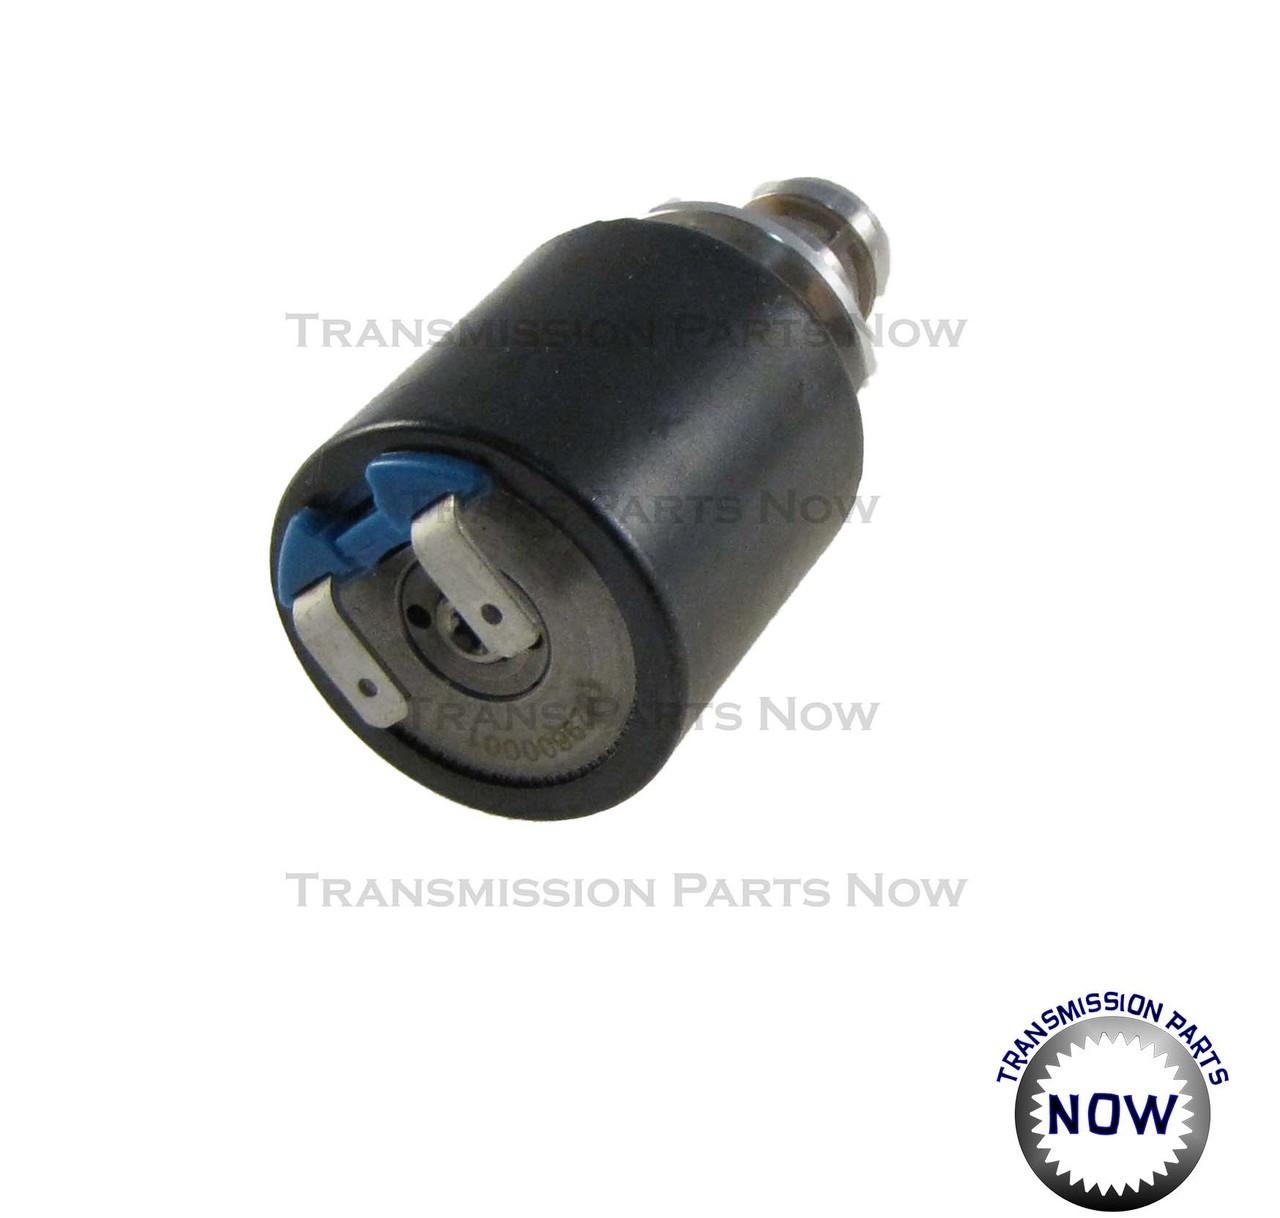 Transmission solenoid, transmission parts, 4L30E, 4L60E, 4L80E, Pressure control solenoid, EPC, Line pressure solenoid, 34435A, 24220158